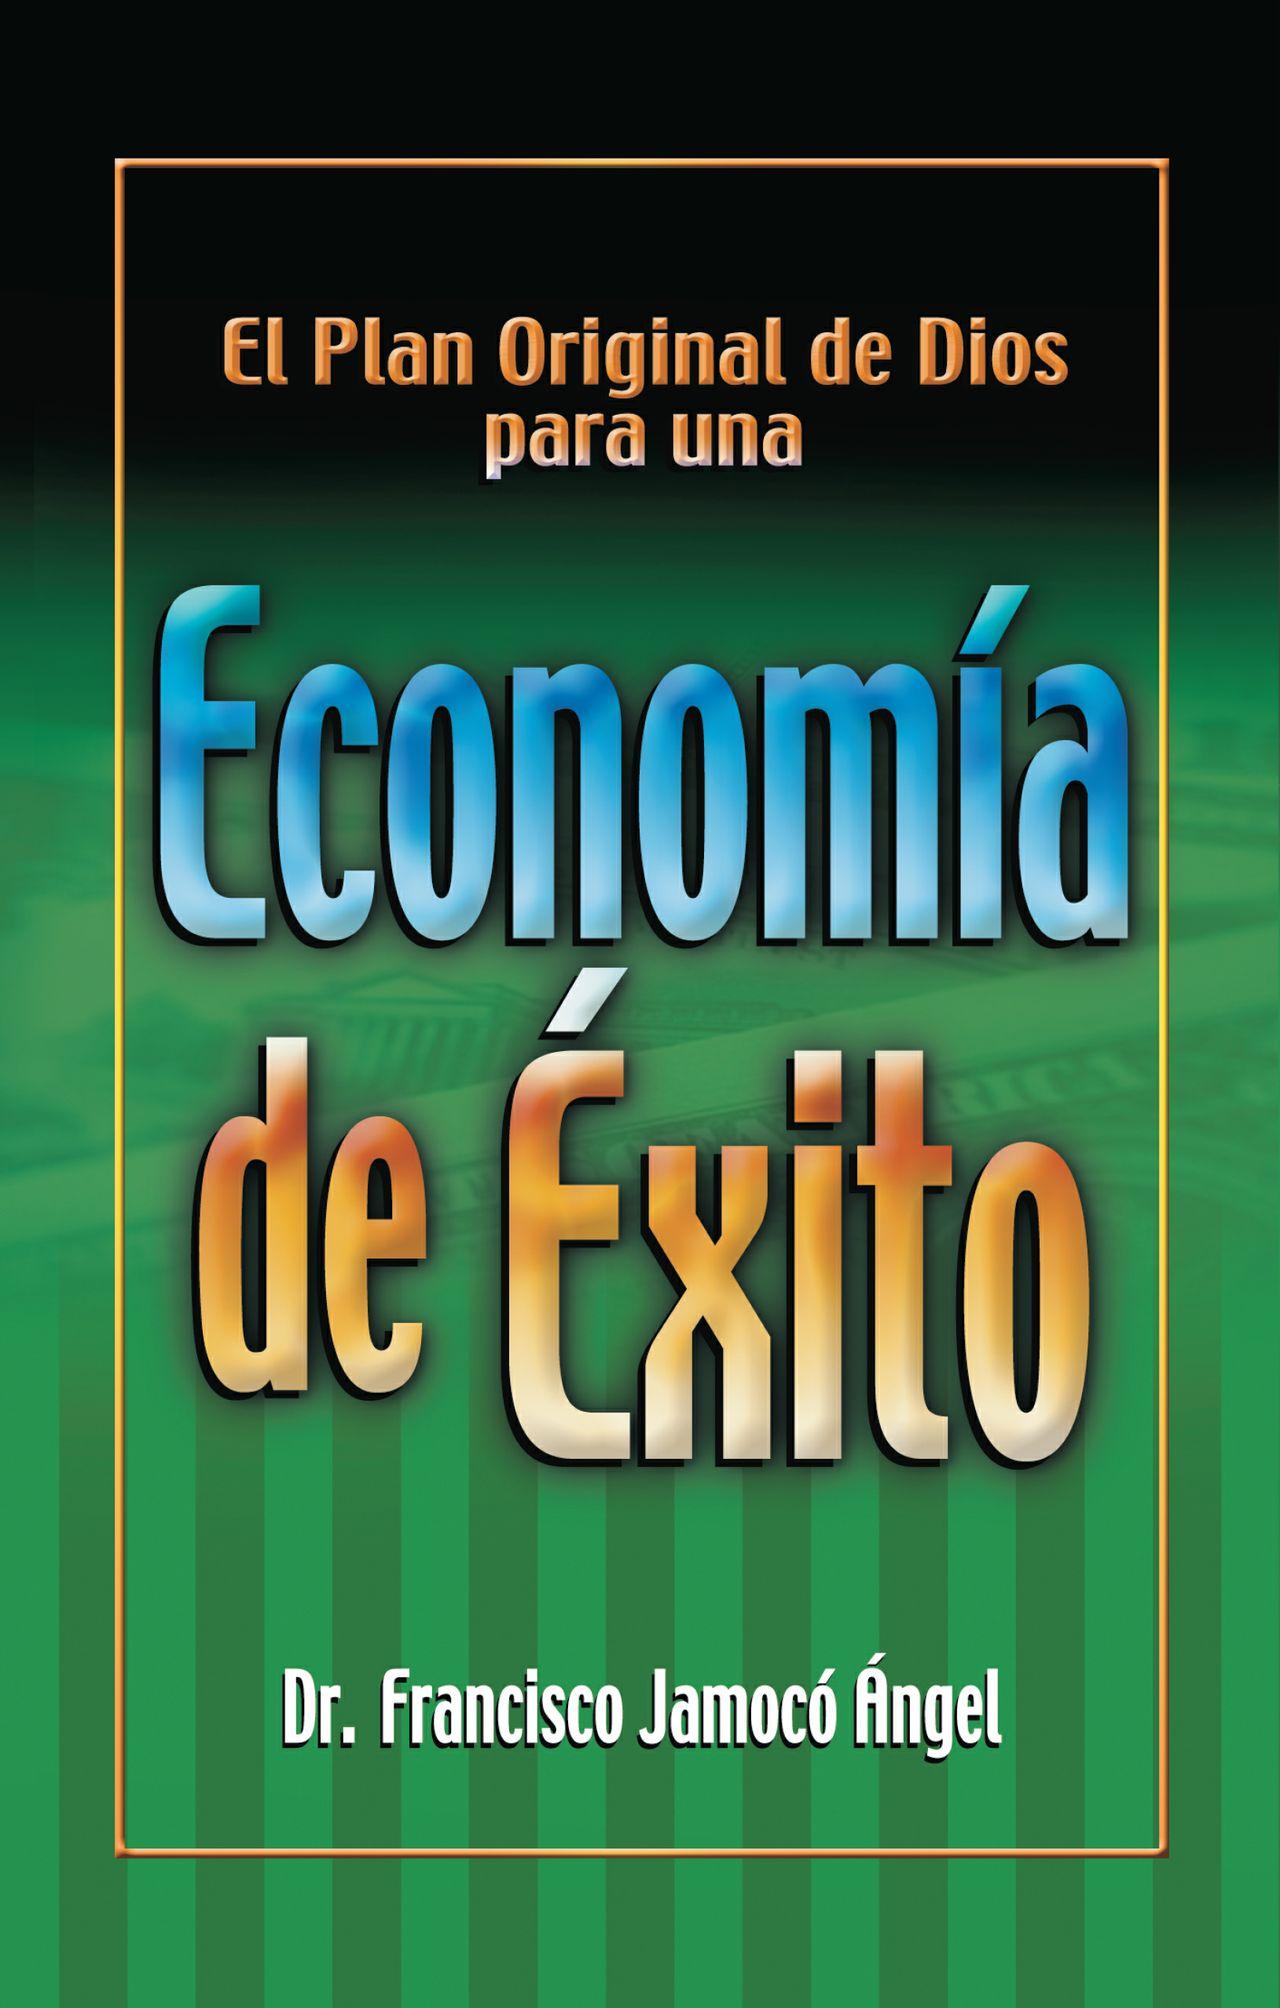 Economía de éxito